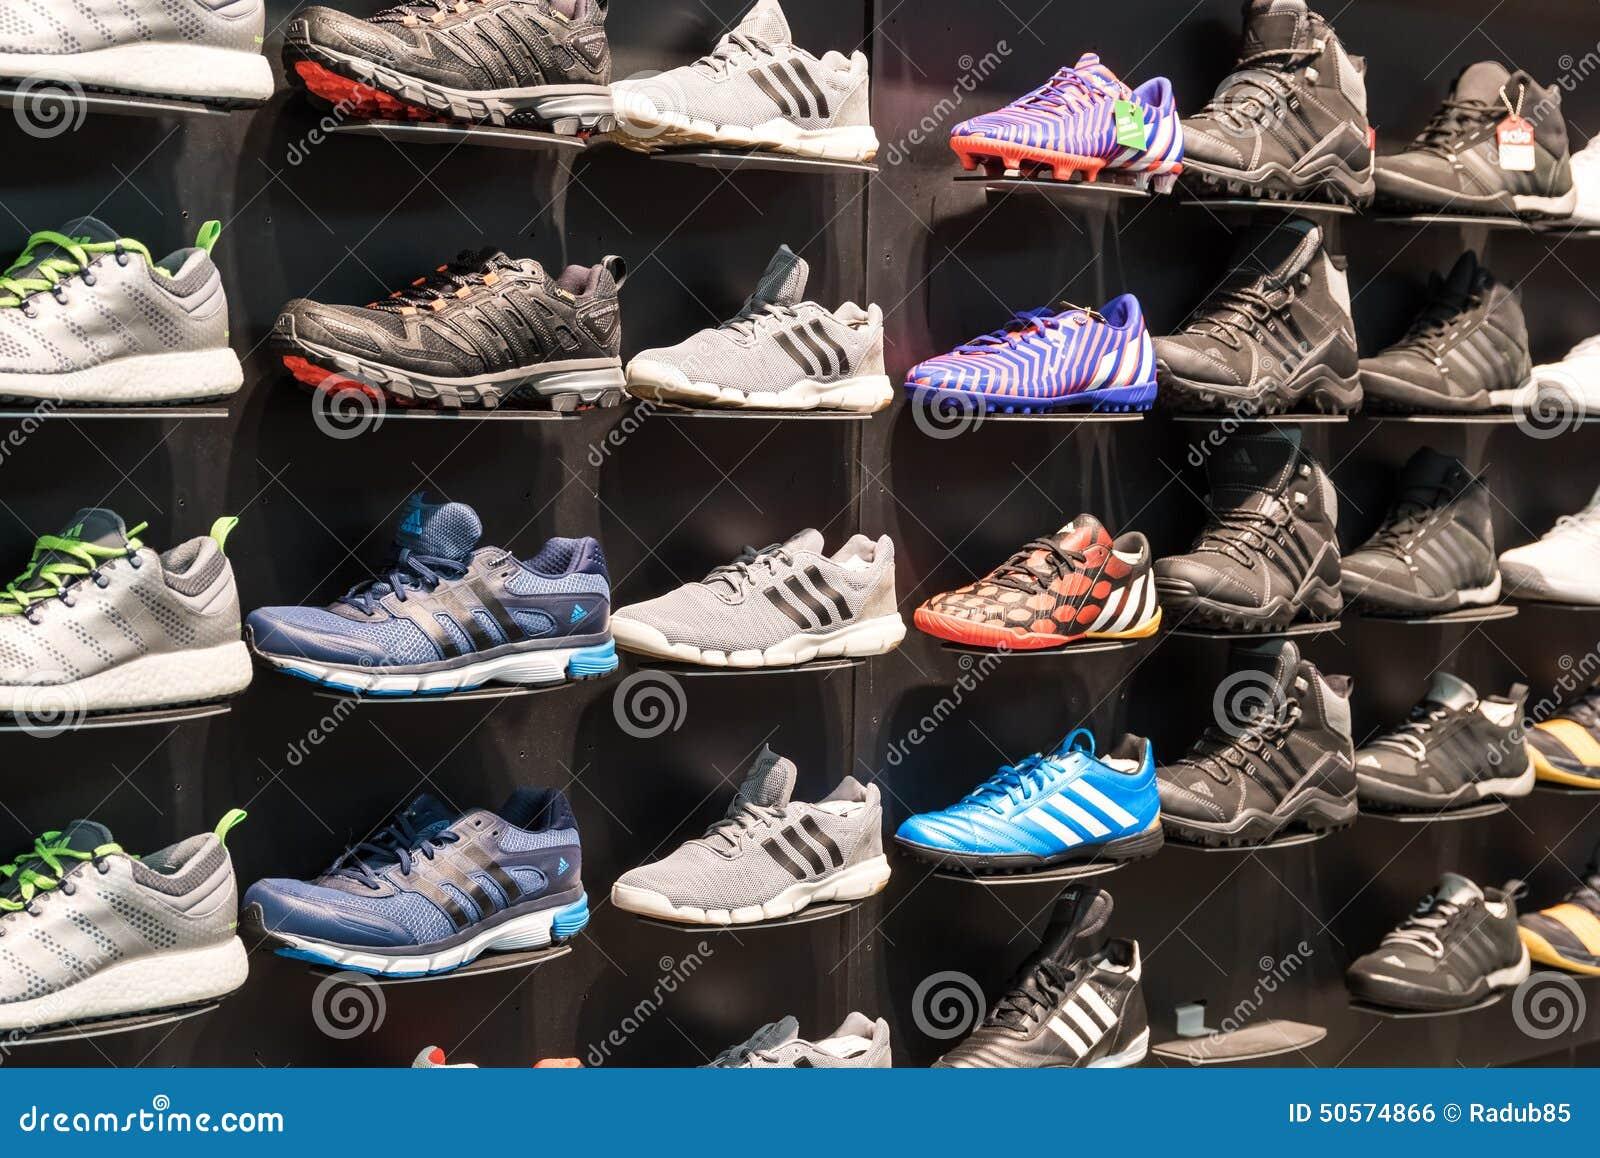 adidas scarpe negozio